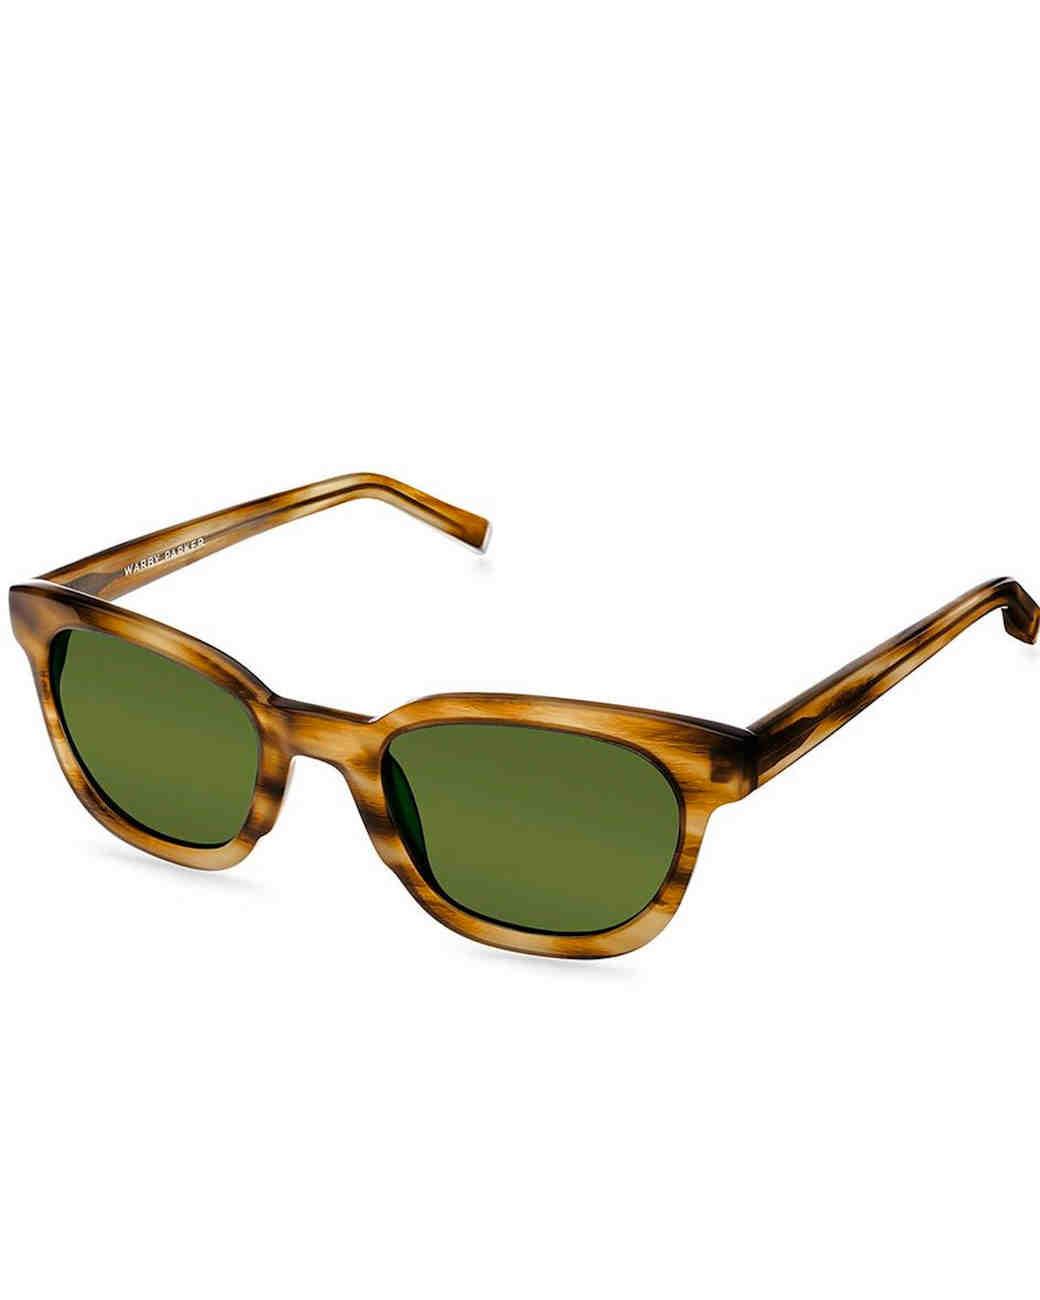 groomsmen-gift-ideas-warby-parker-sunglasses-0614.jpg